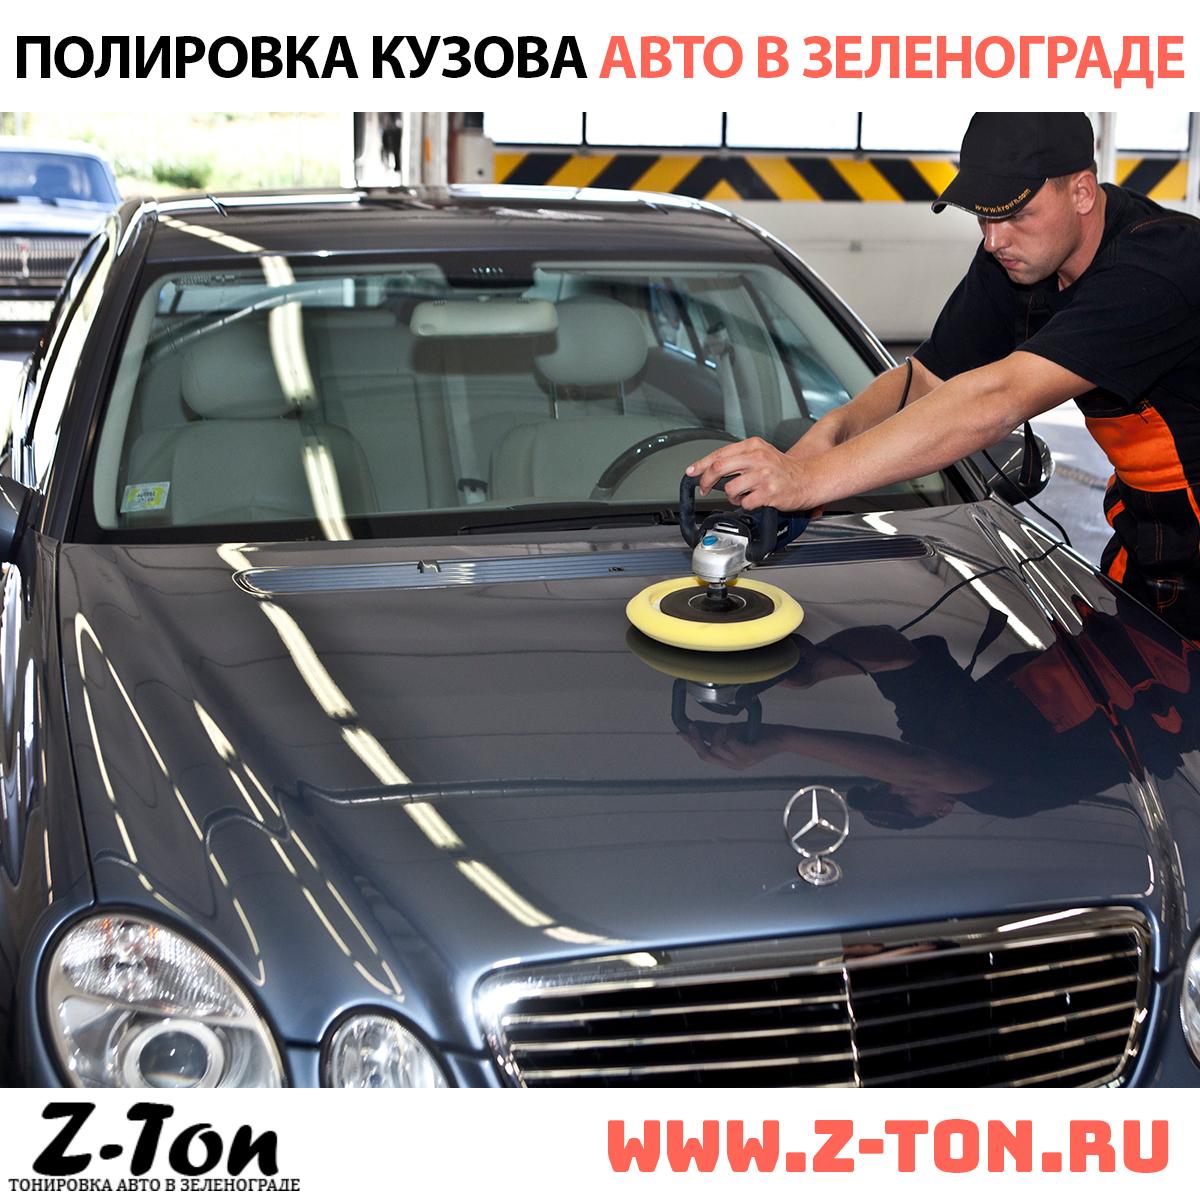 Полировка кузова автомобиля в Зеленограде (Андреевка, Крюково, Москва)